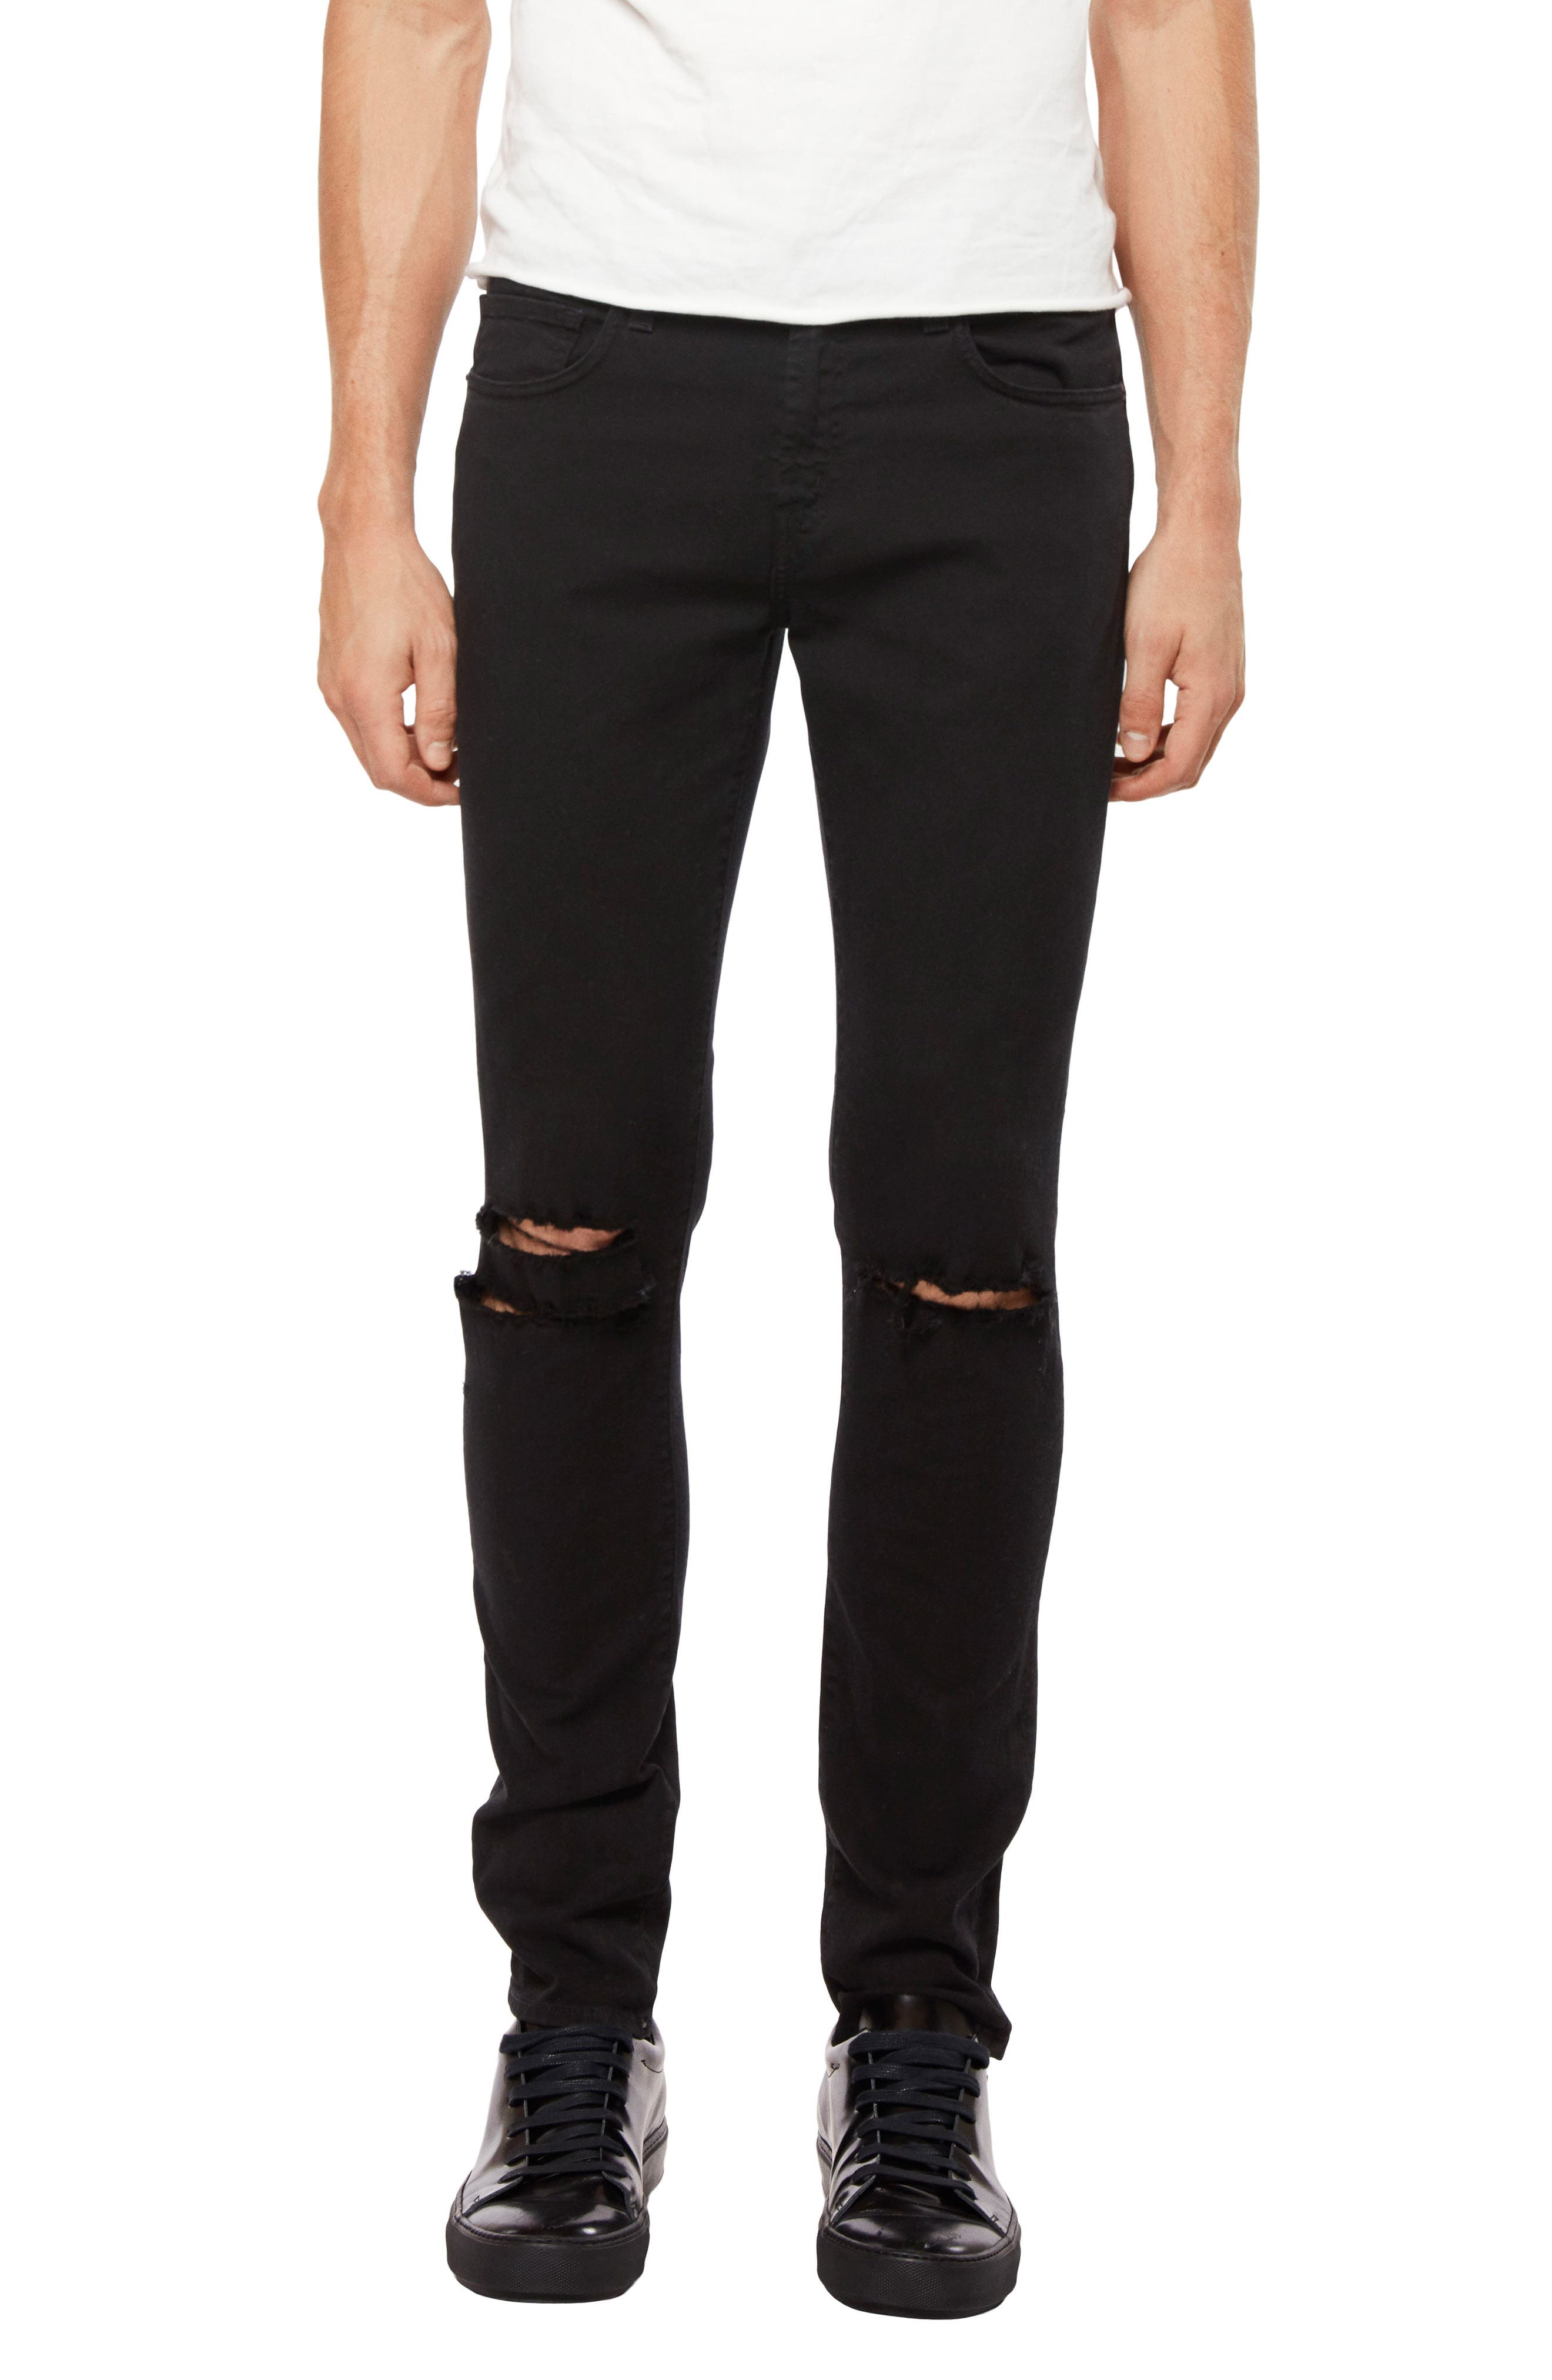 Mick Skinny Fit Jeans,                             Main thumbnail 1, color,                             001